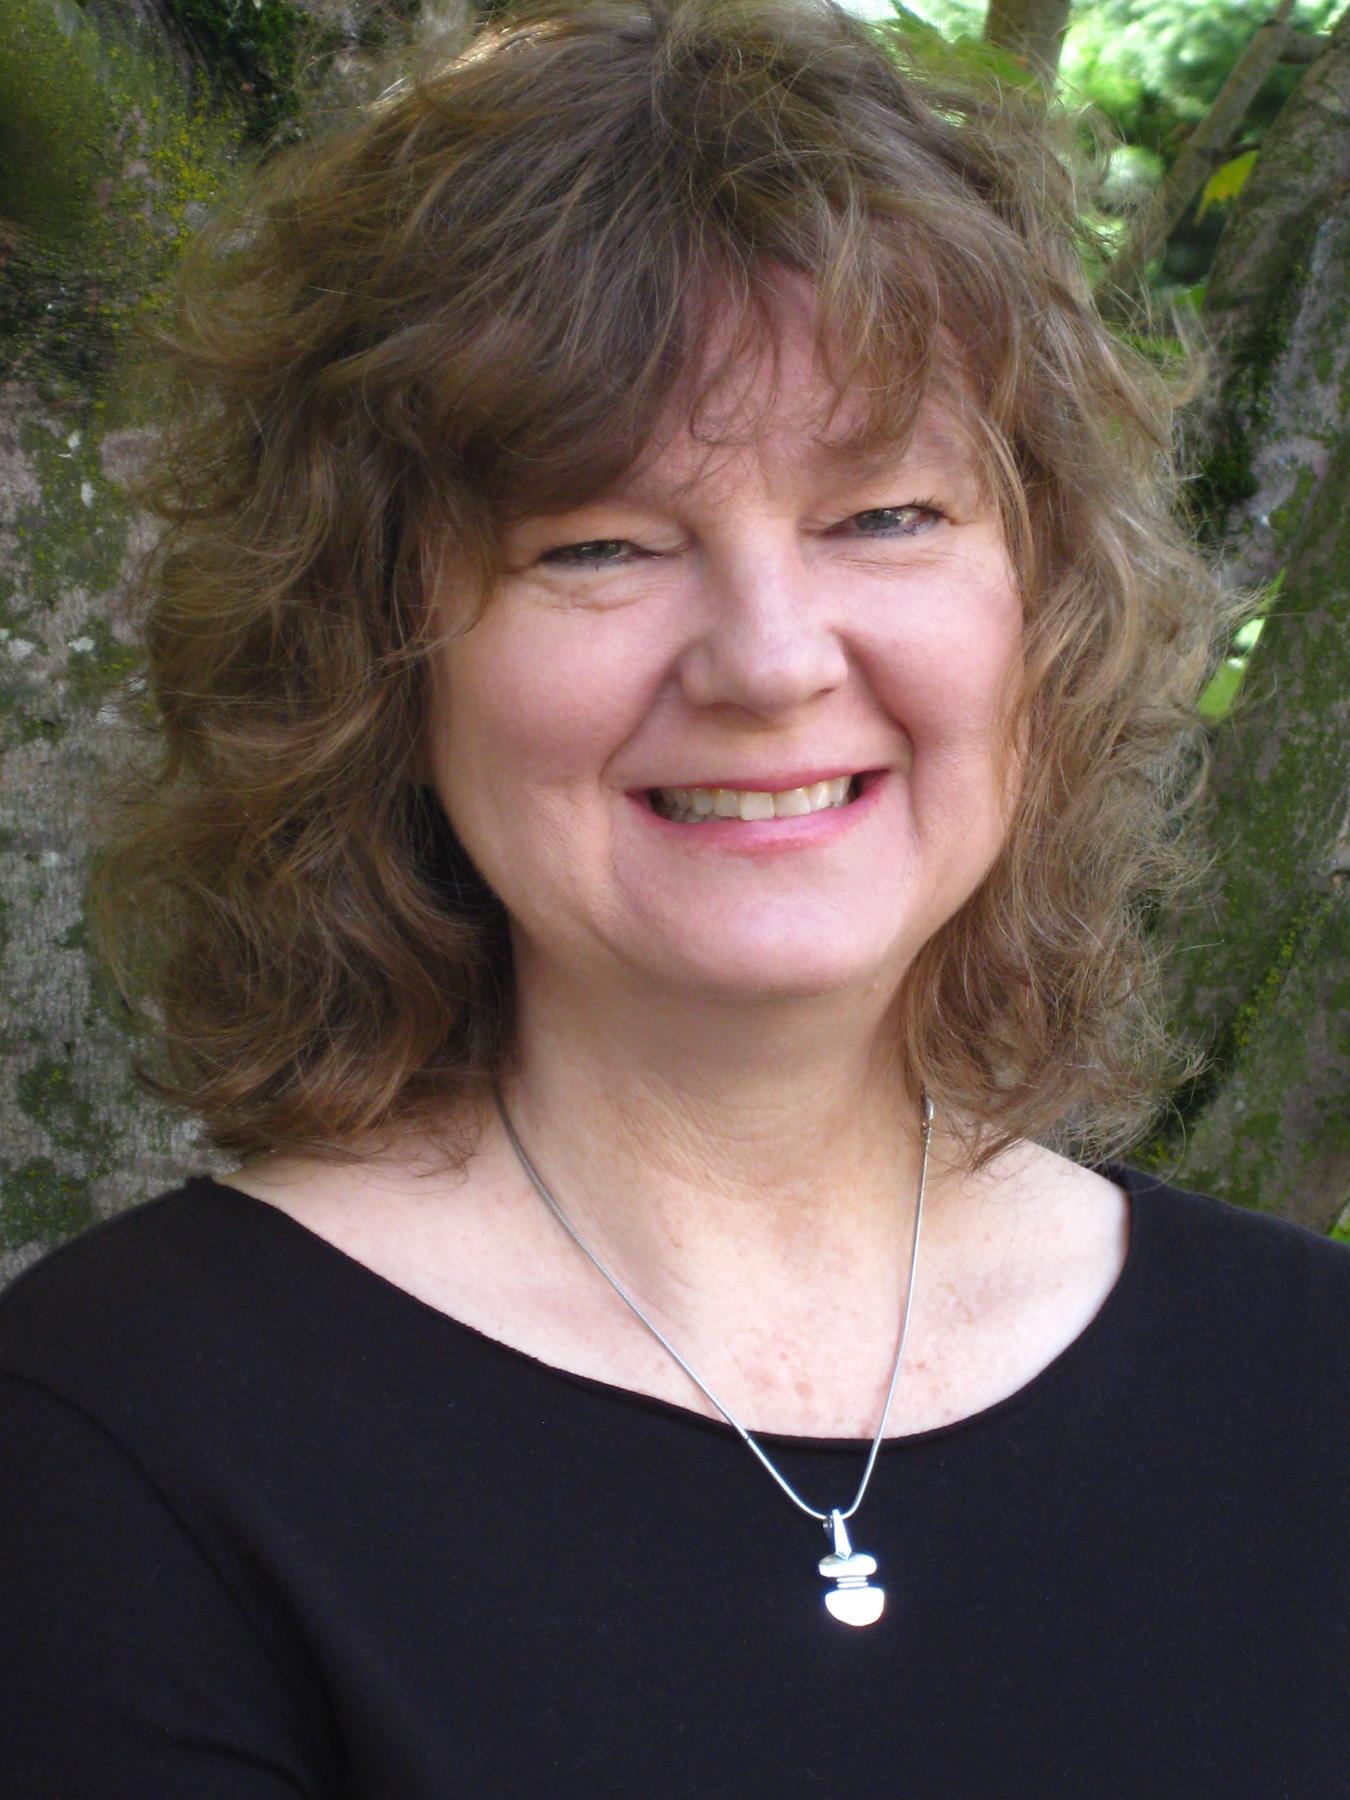 Ellen Lorenzi-Prince